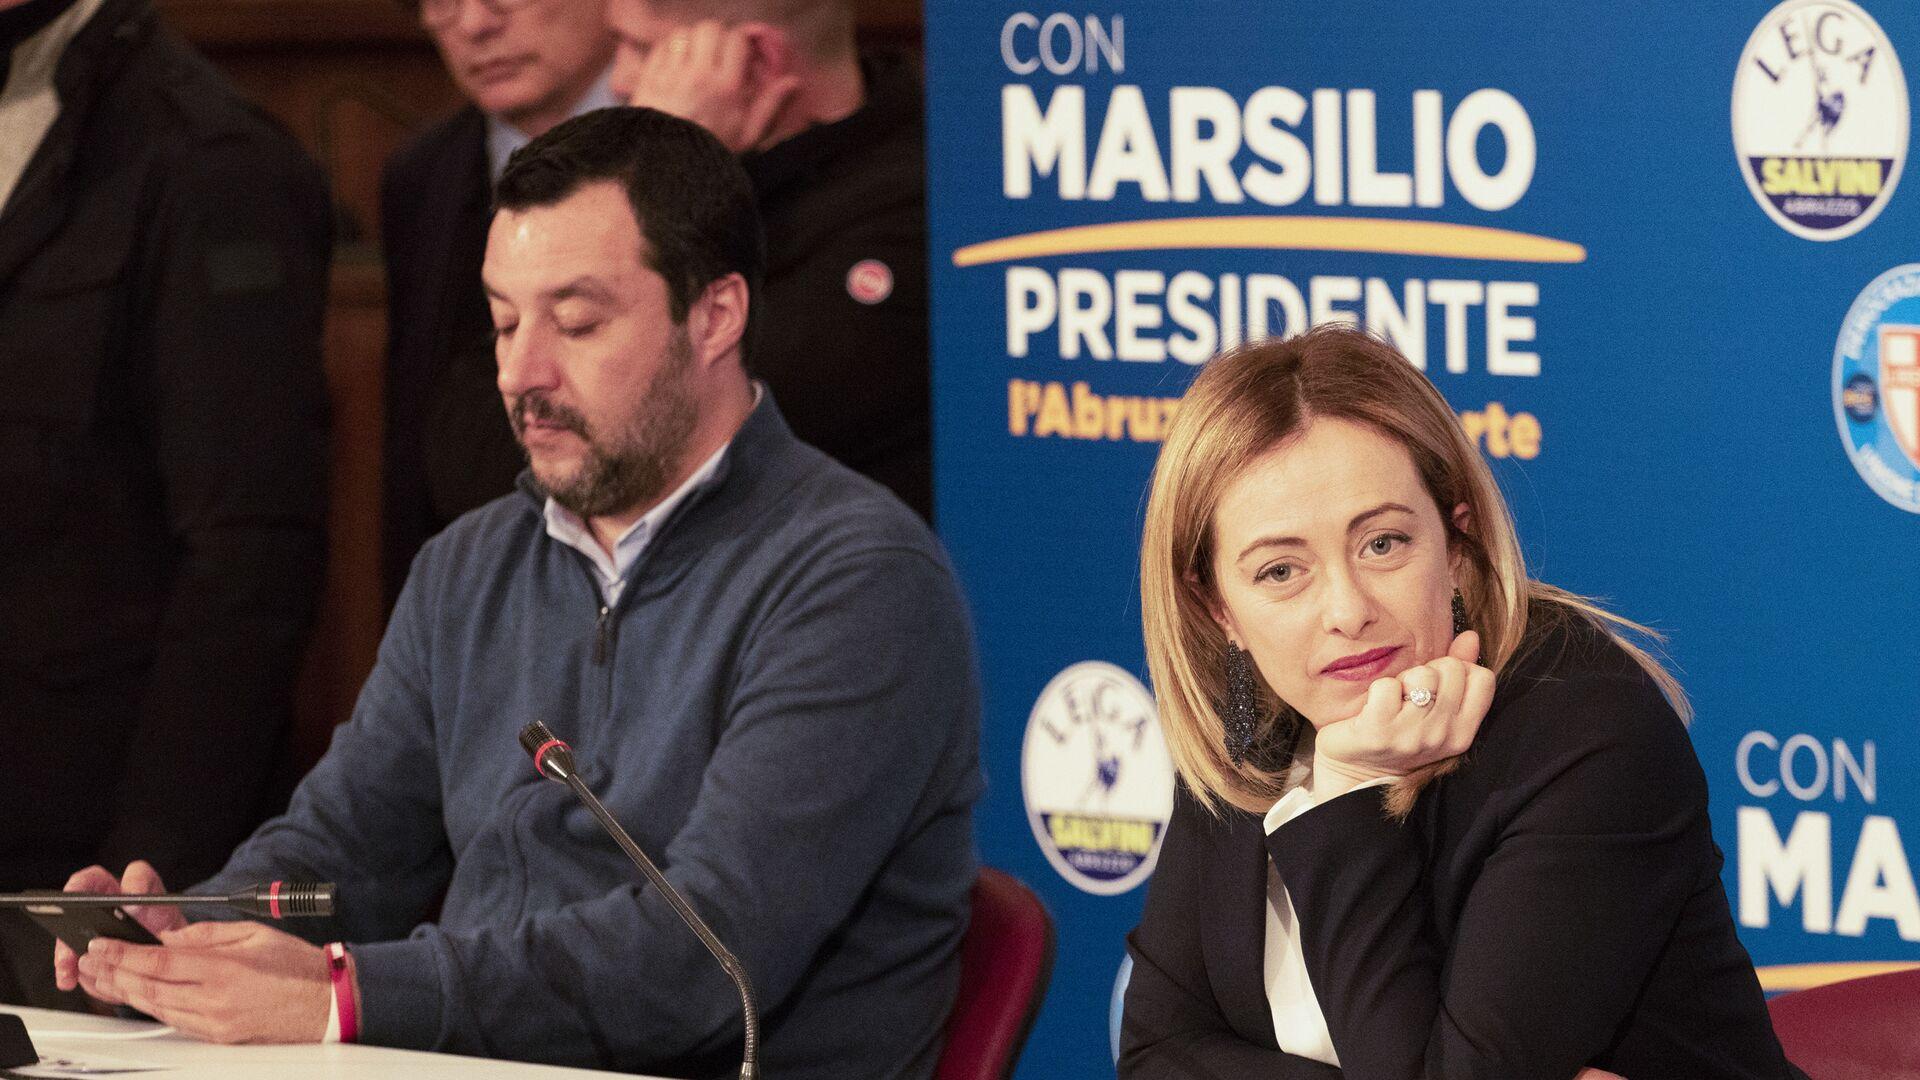 Matteo Salvini e Giorgia Meloni - Sputnik Italia, 1920, 06.06.2021